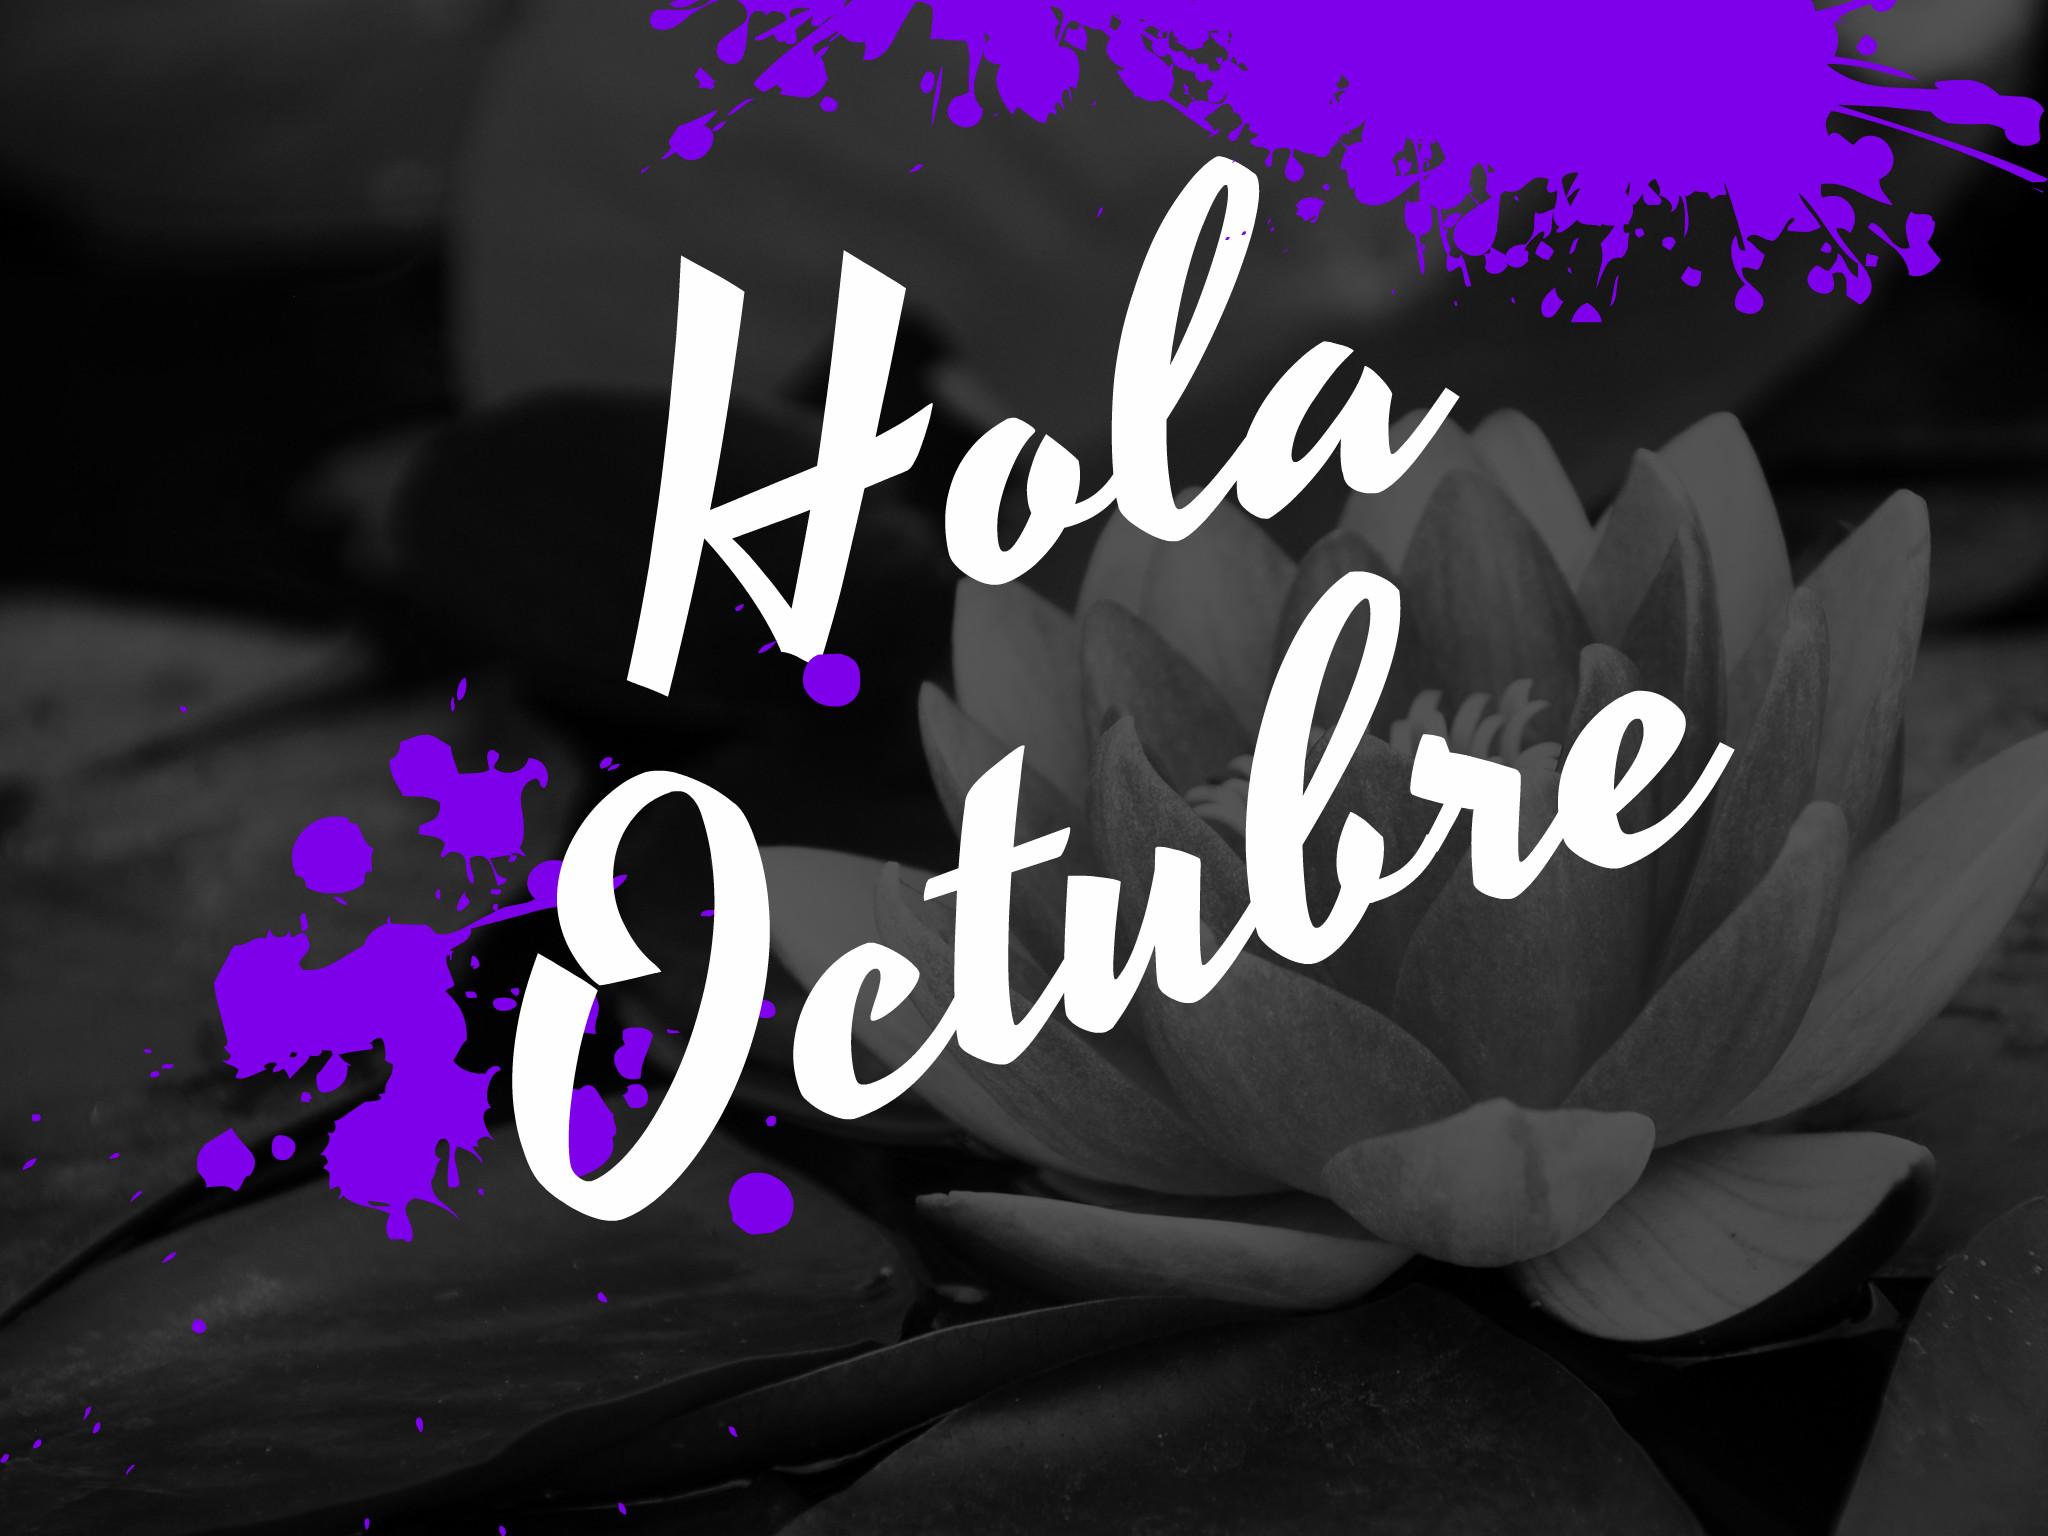 imagenes-de-hola-octubre